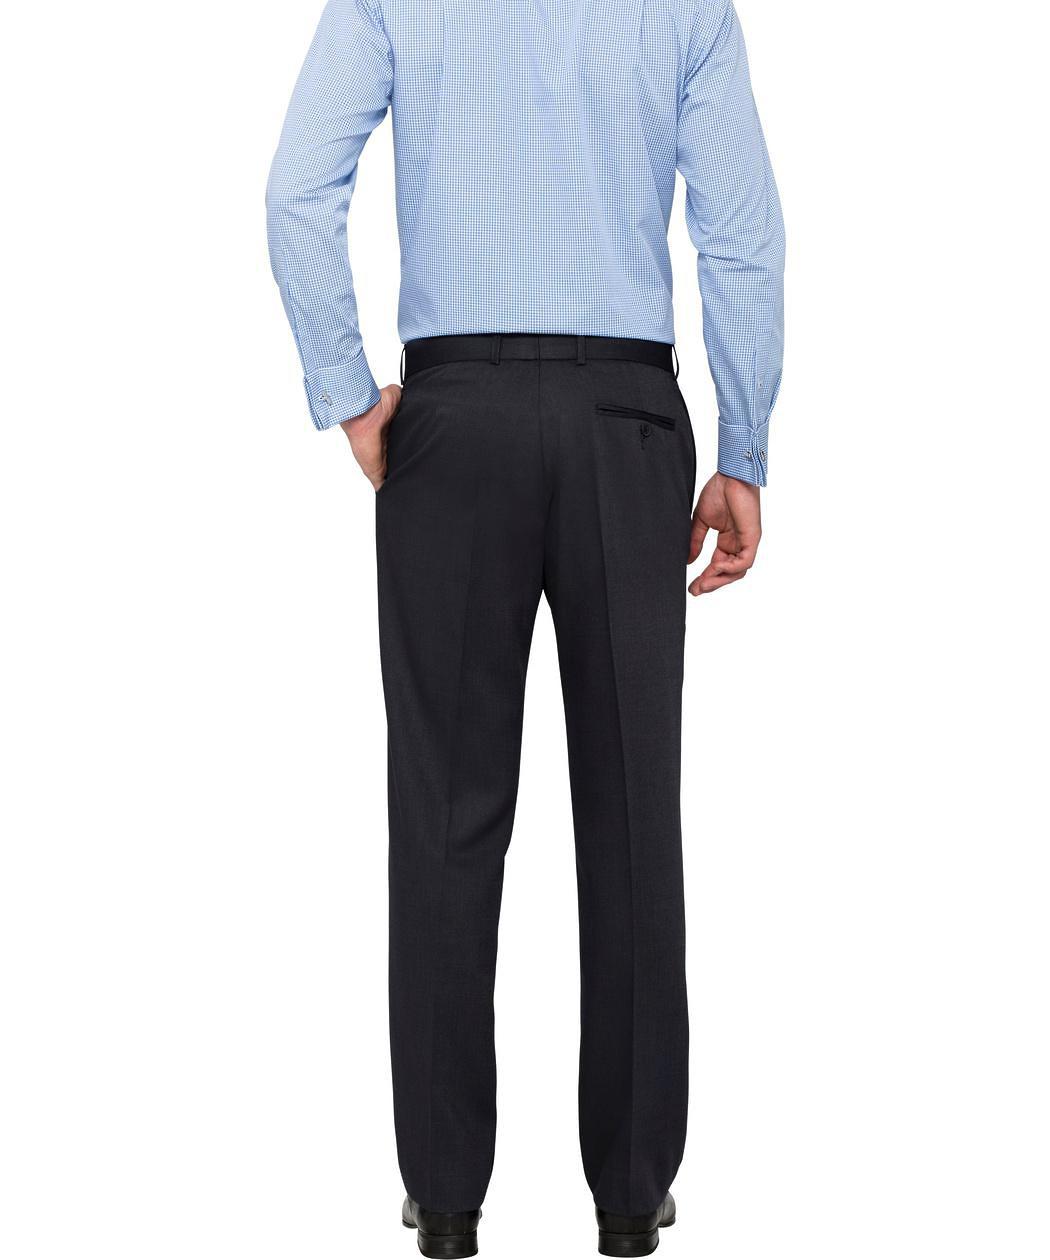 van heusen classic fit navy texture pant mens pants